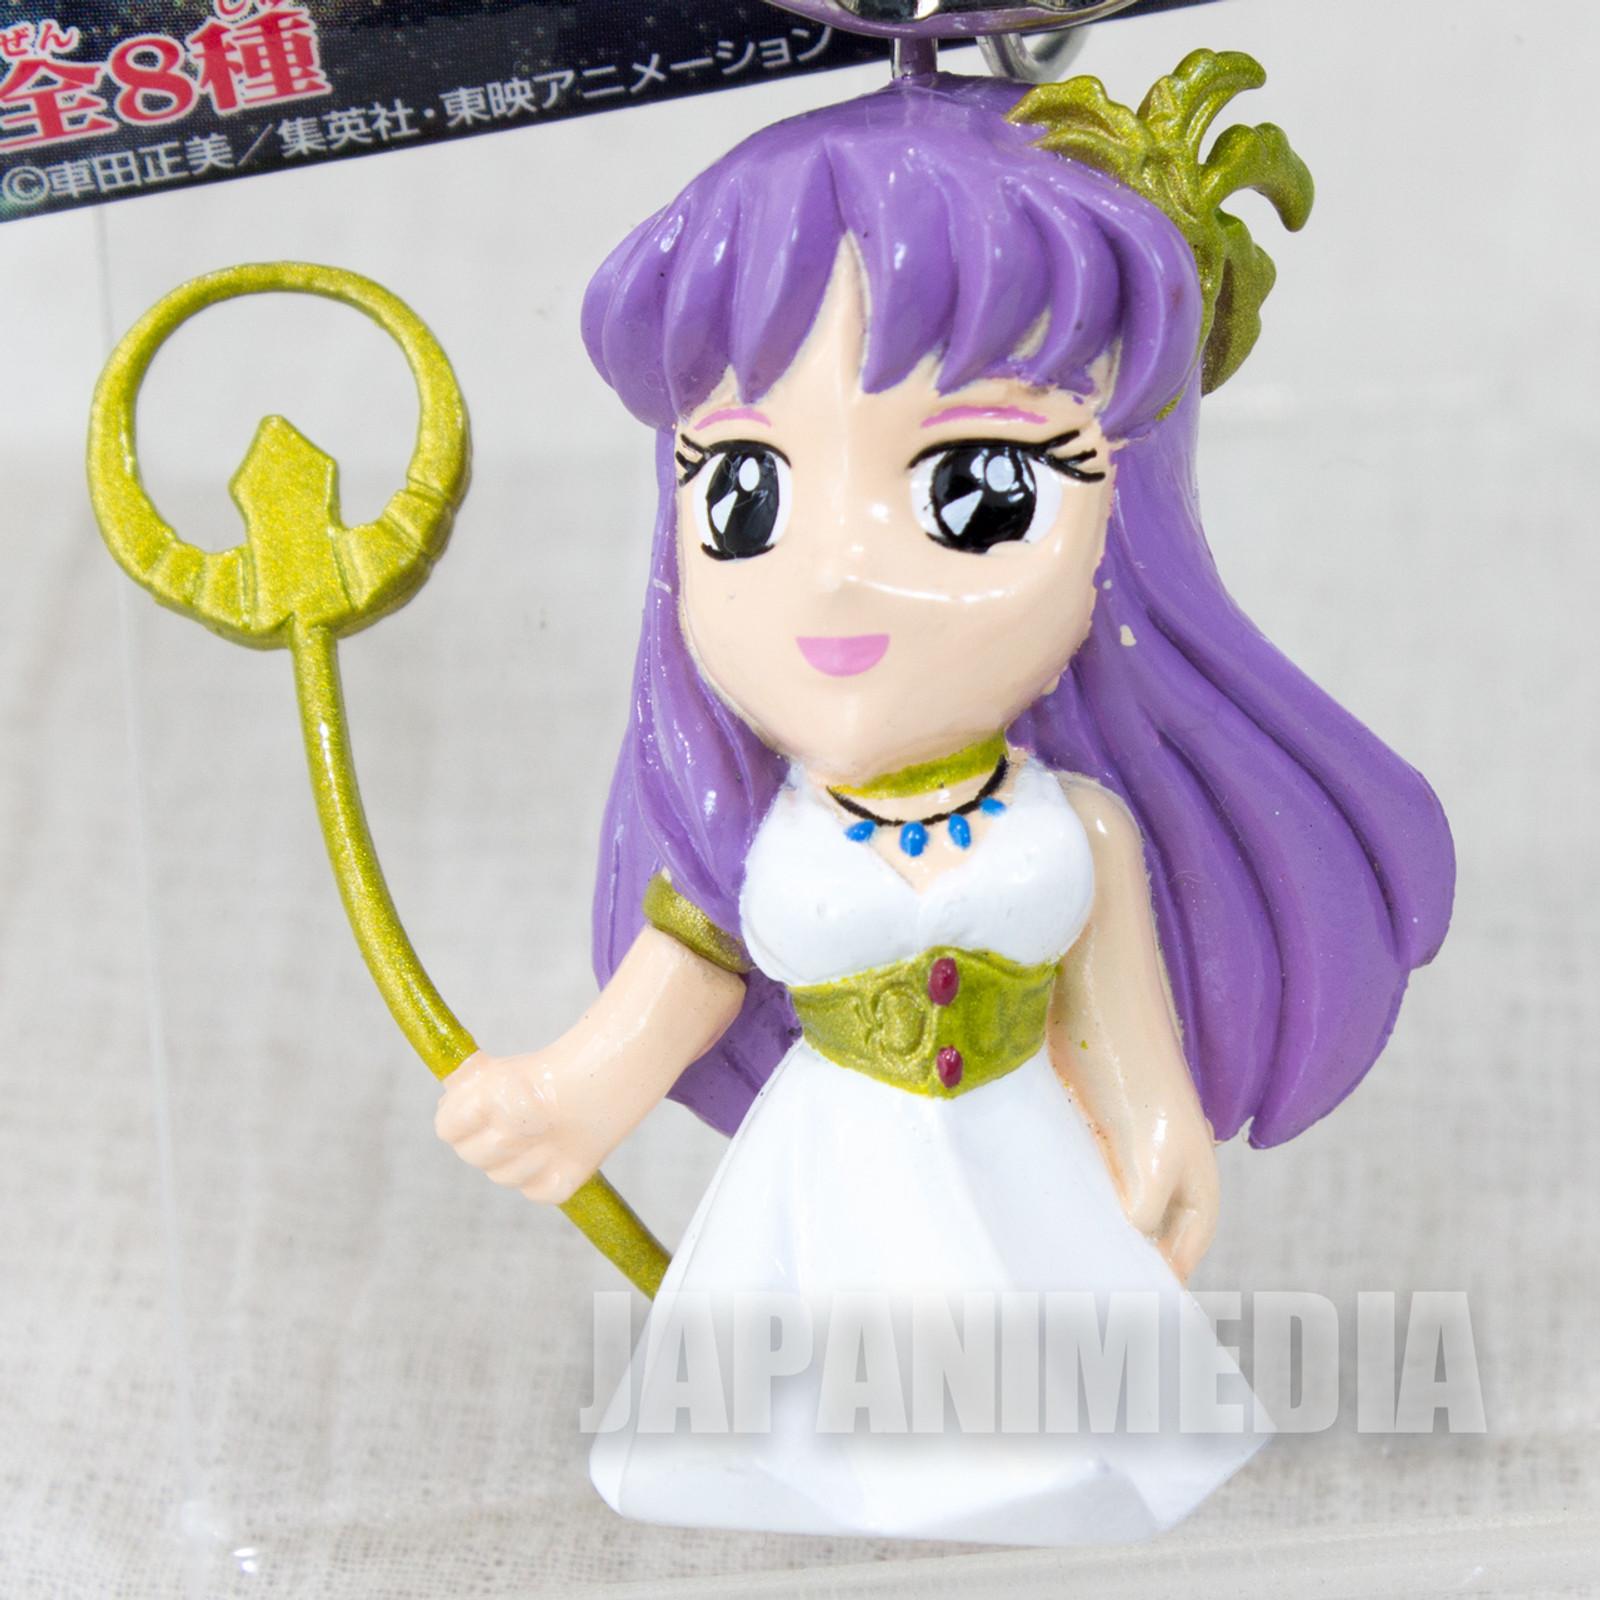 Saint Seiya Athena Saori Kido Figure Key Chain JAPAN ANIME MANGA